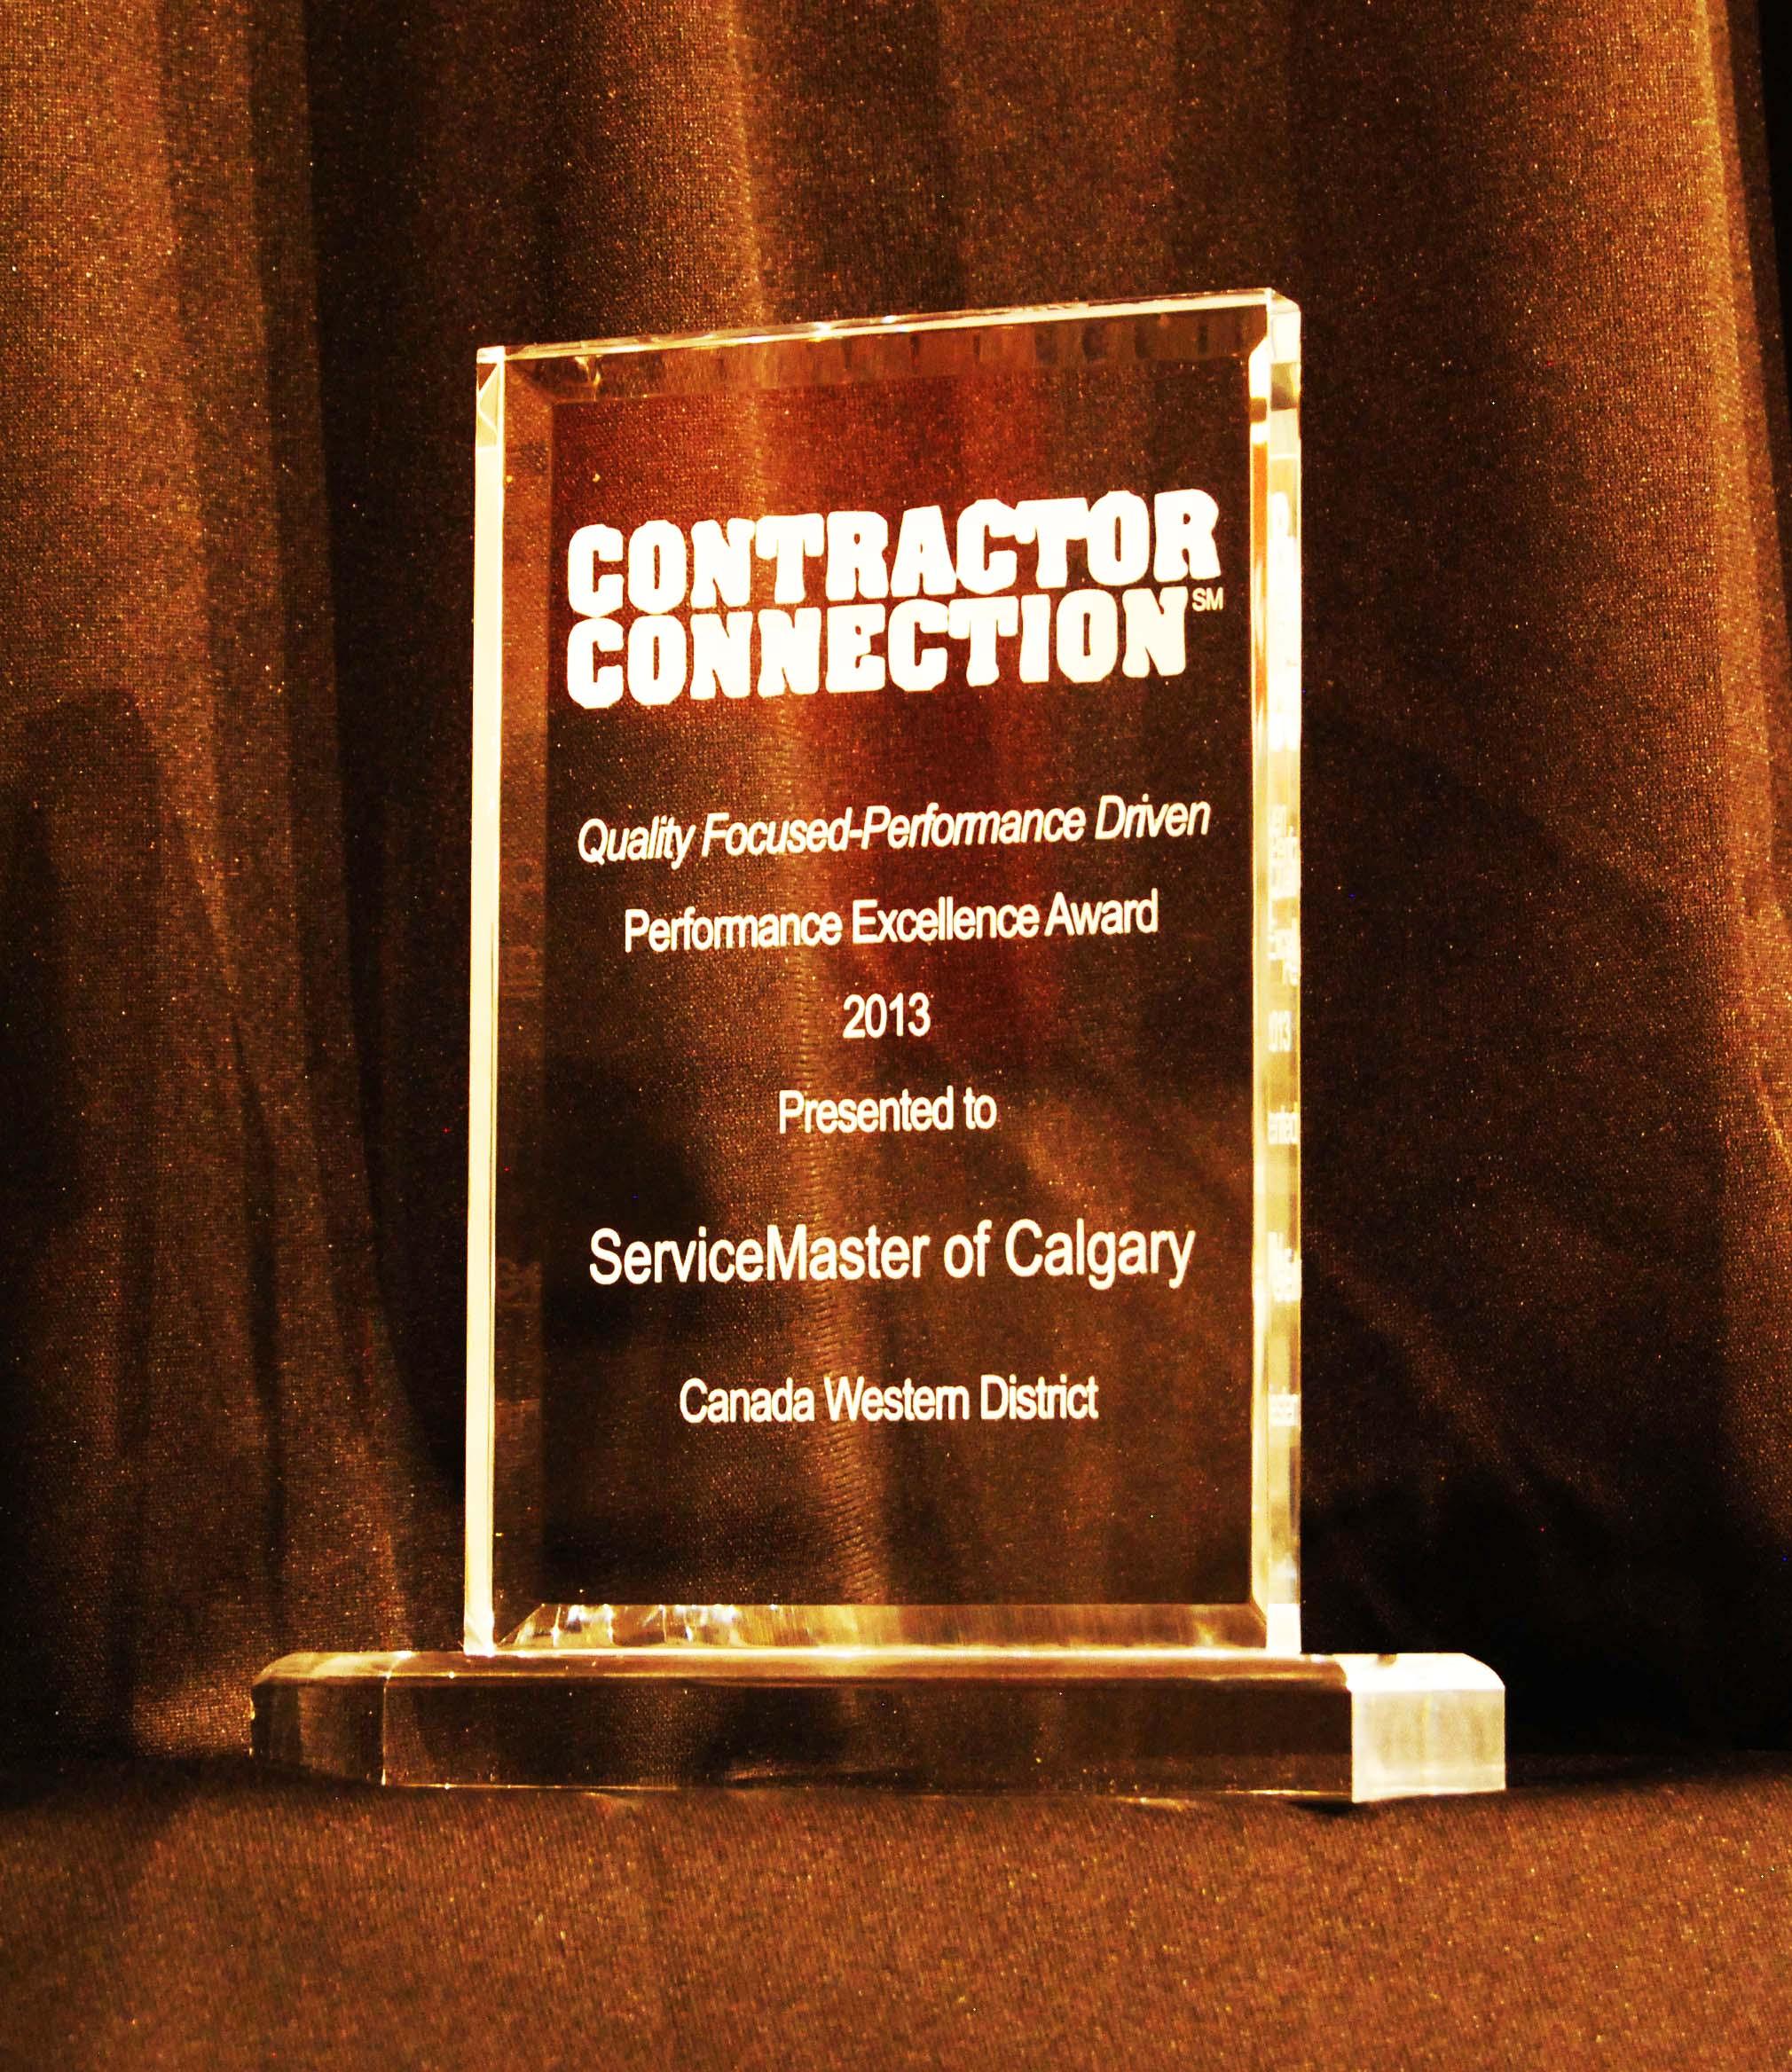 Contractor Connection 2013 Award